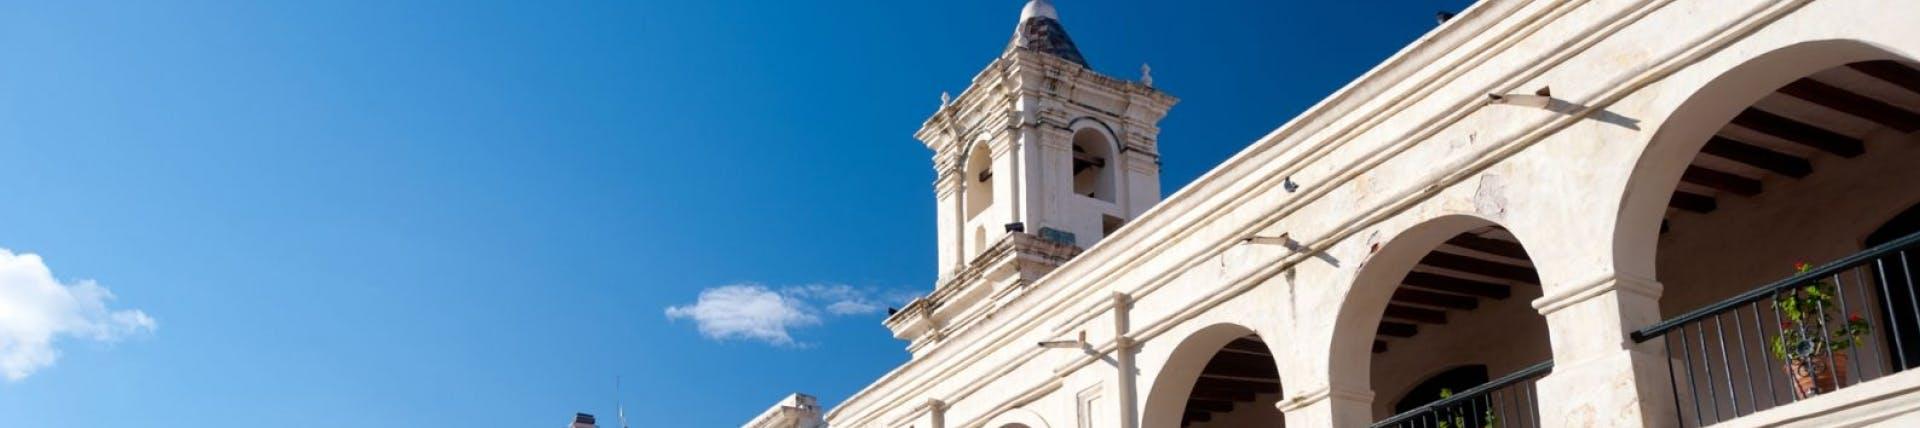 Picture of Salta